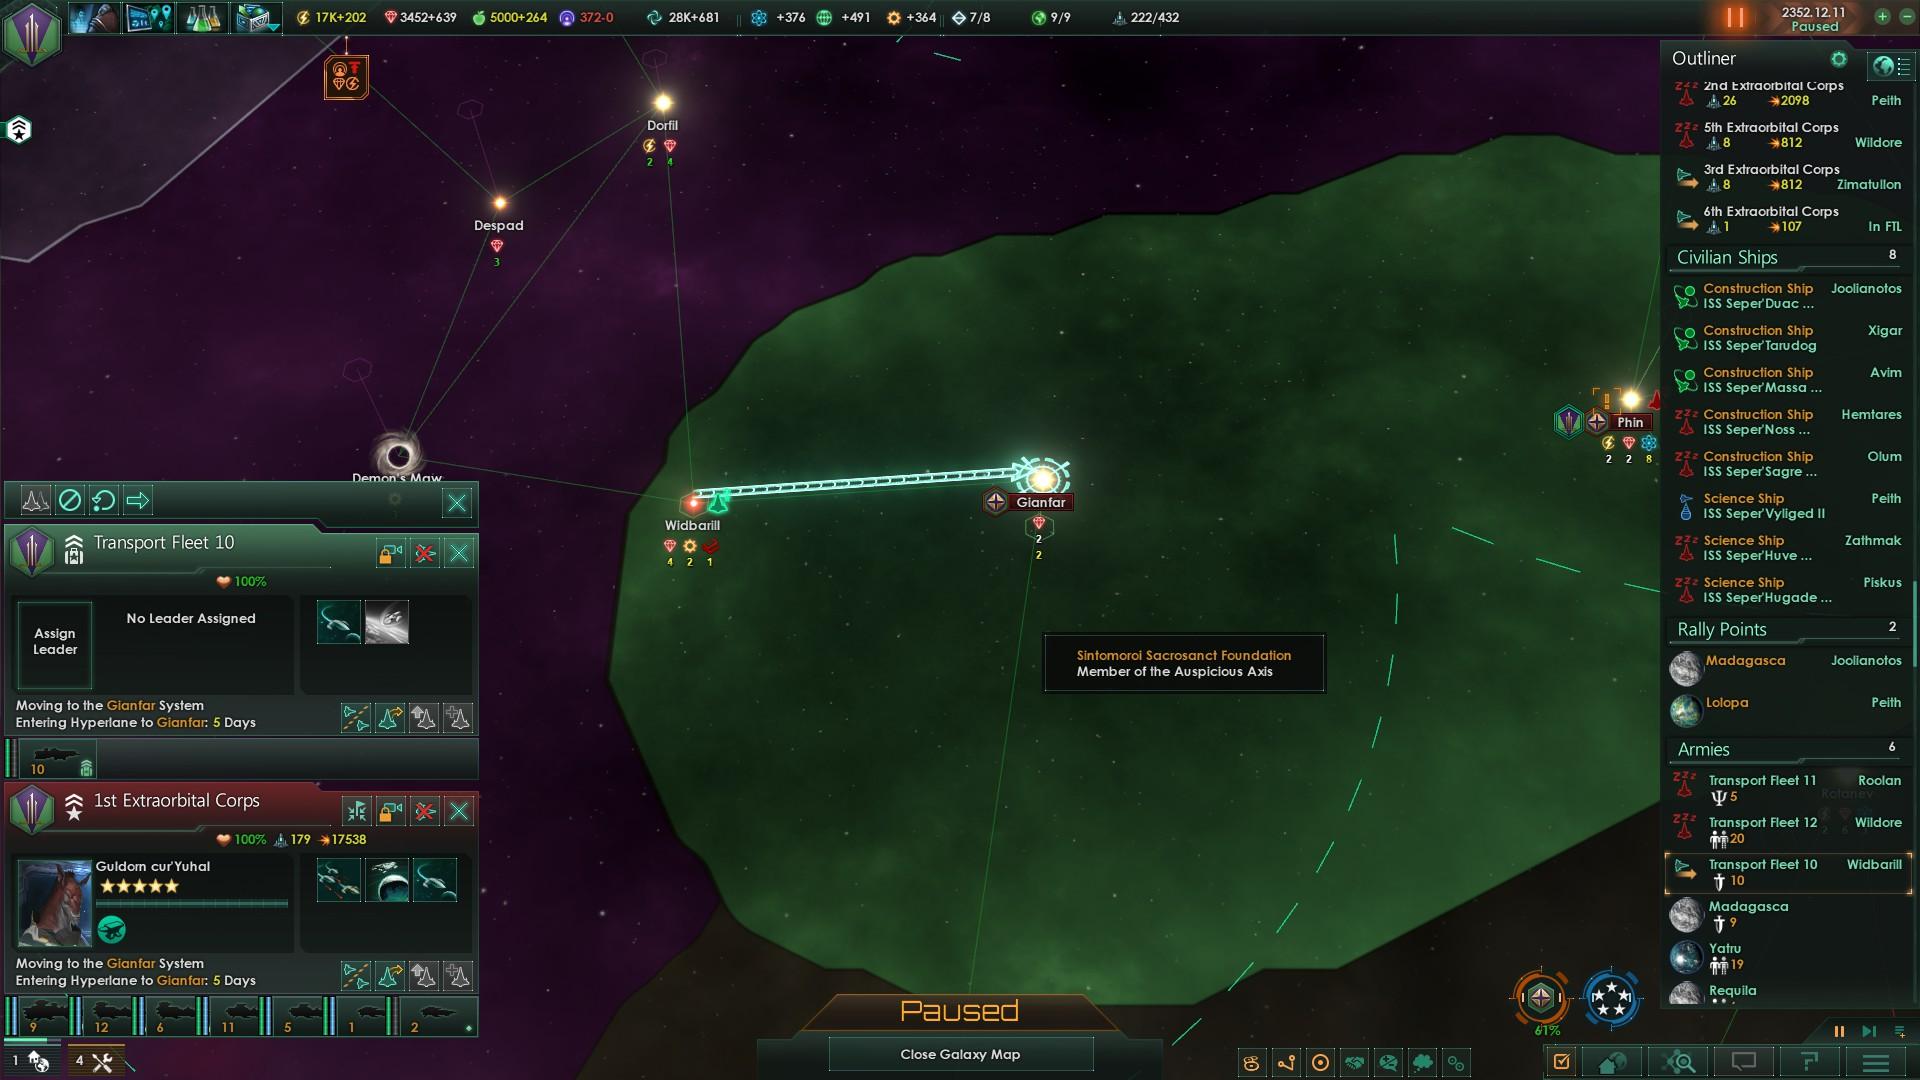 Stellaris - Page 3 - Class 3 Outbreak